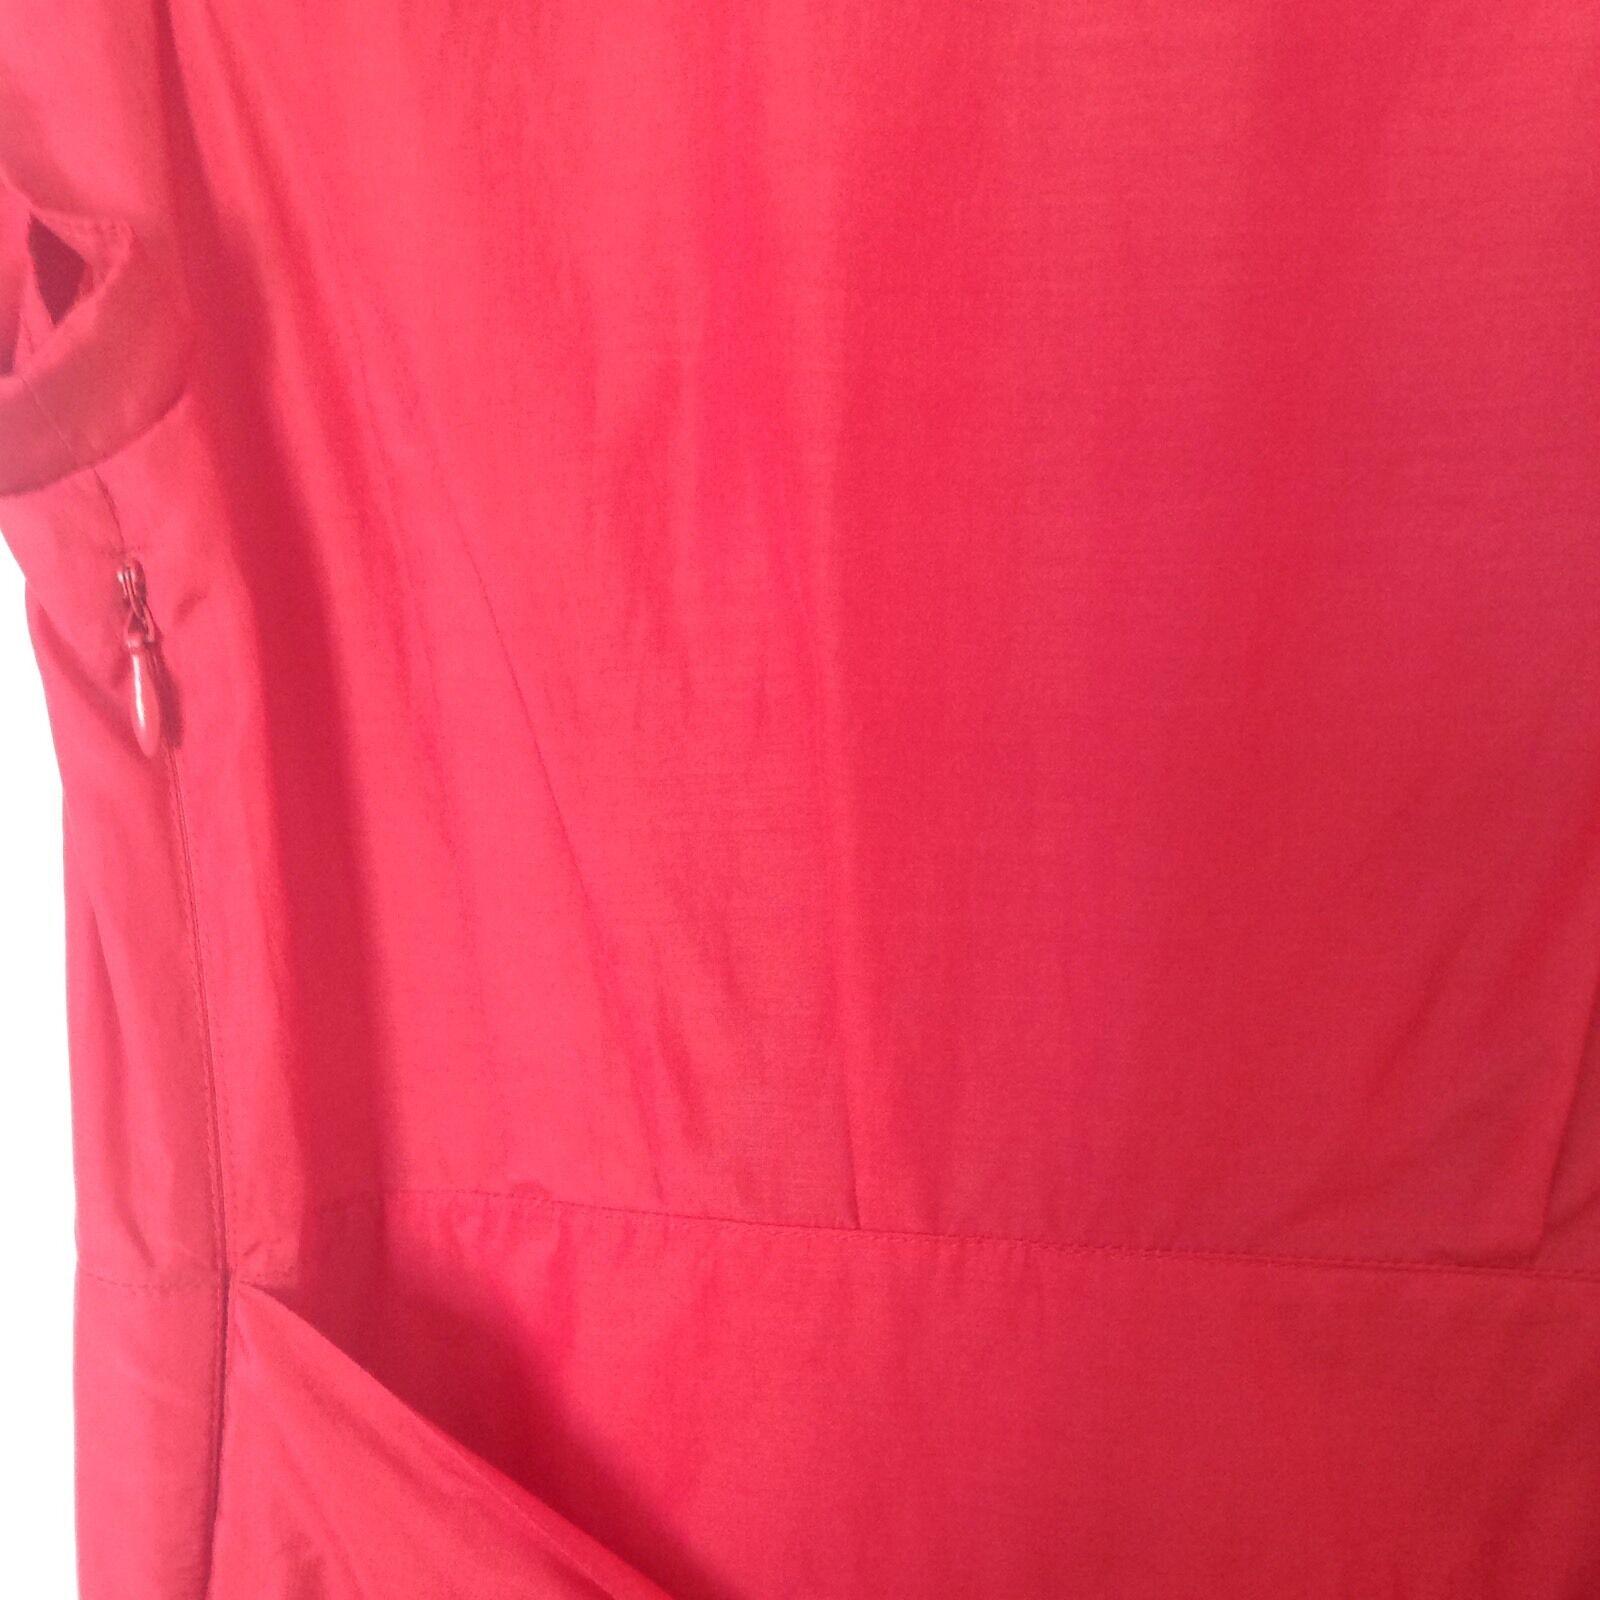 LADIES 'TEDBAKER' 'TEDBAKER' 'TEDBAKER' BRAND NEW PINK SILK FRILL DRESS. SIZE 8  TEDBAKER SIZE 1. 66f84a